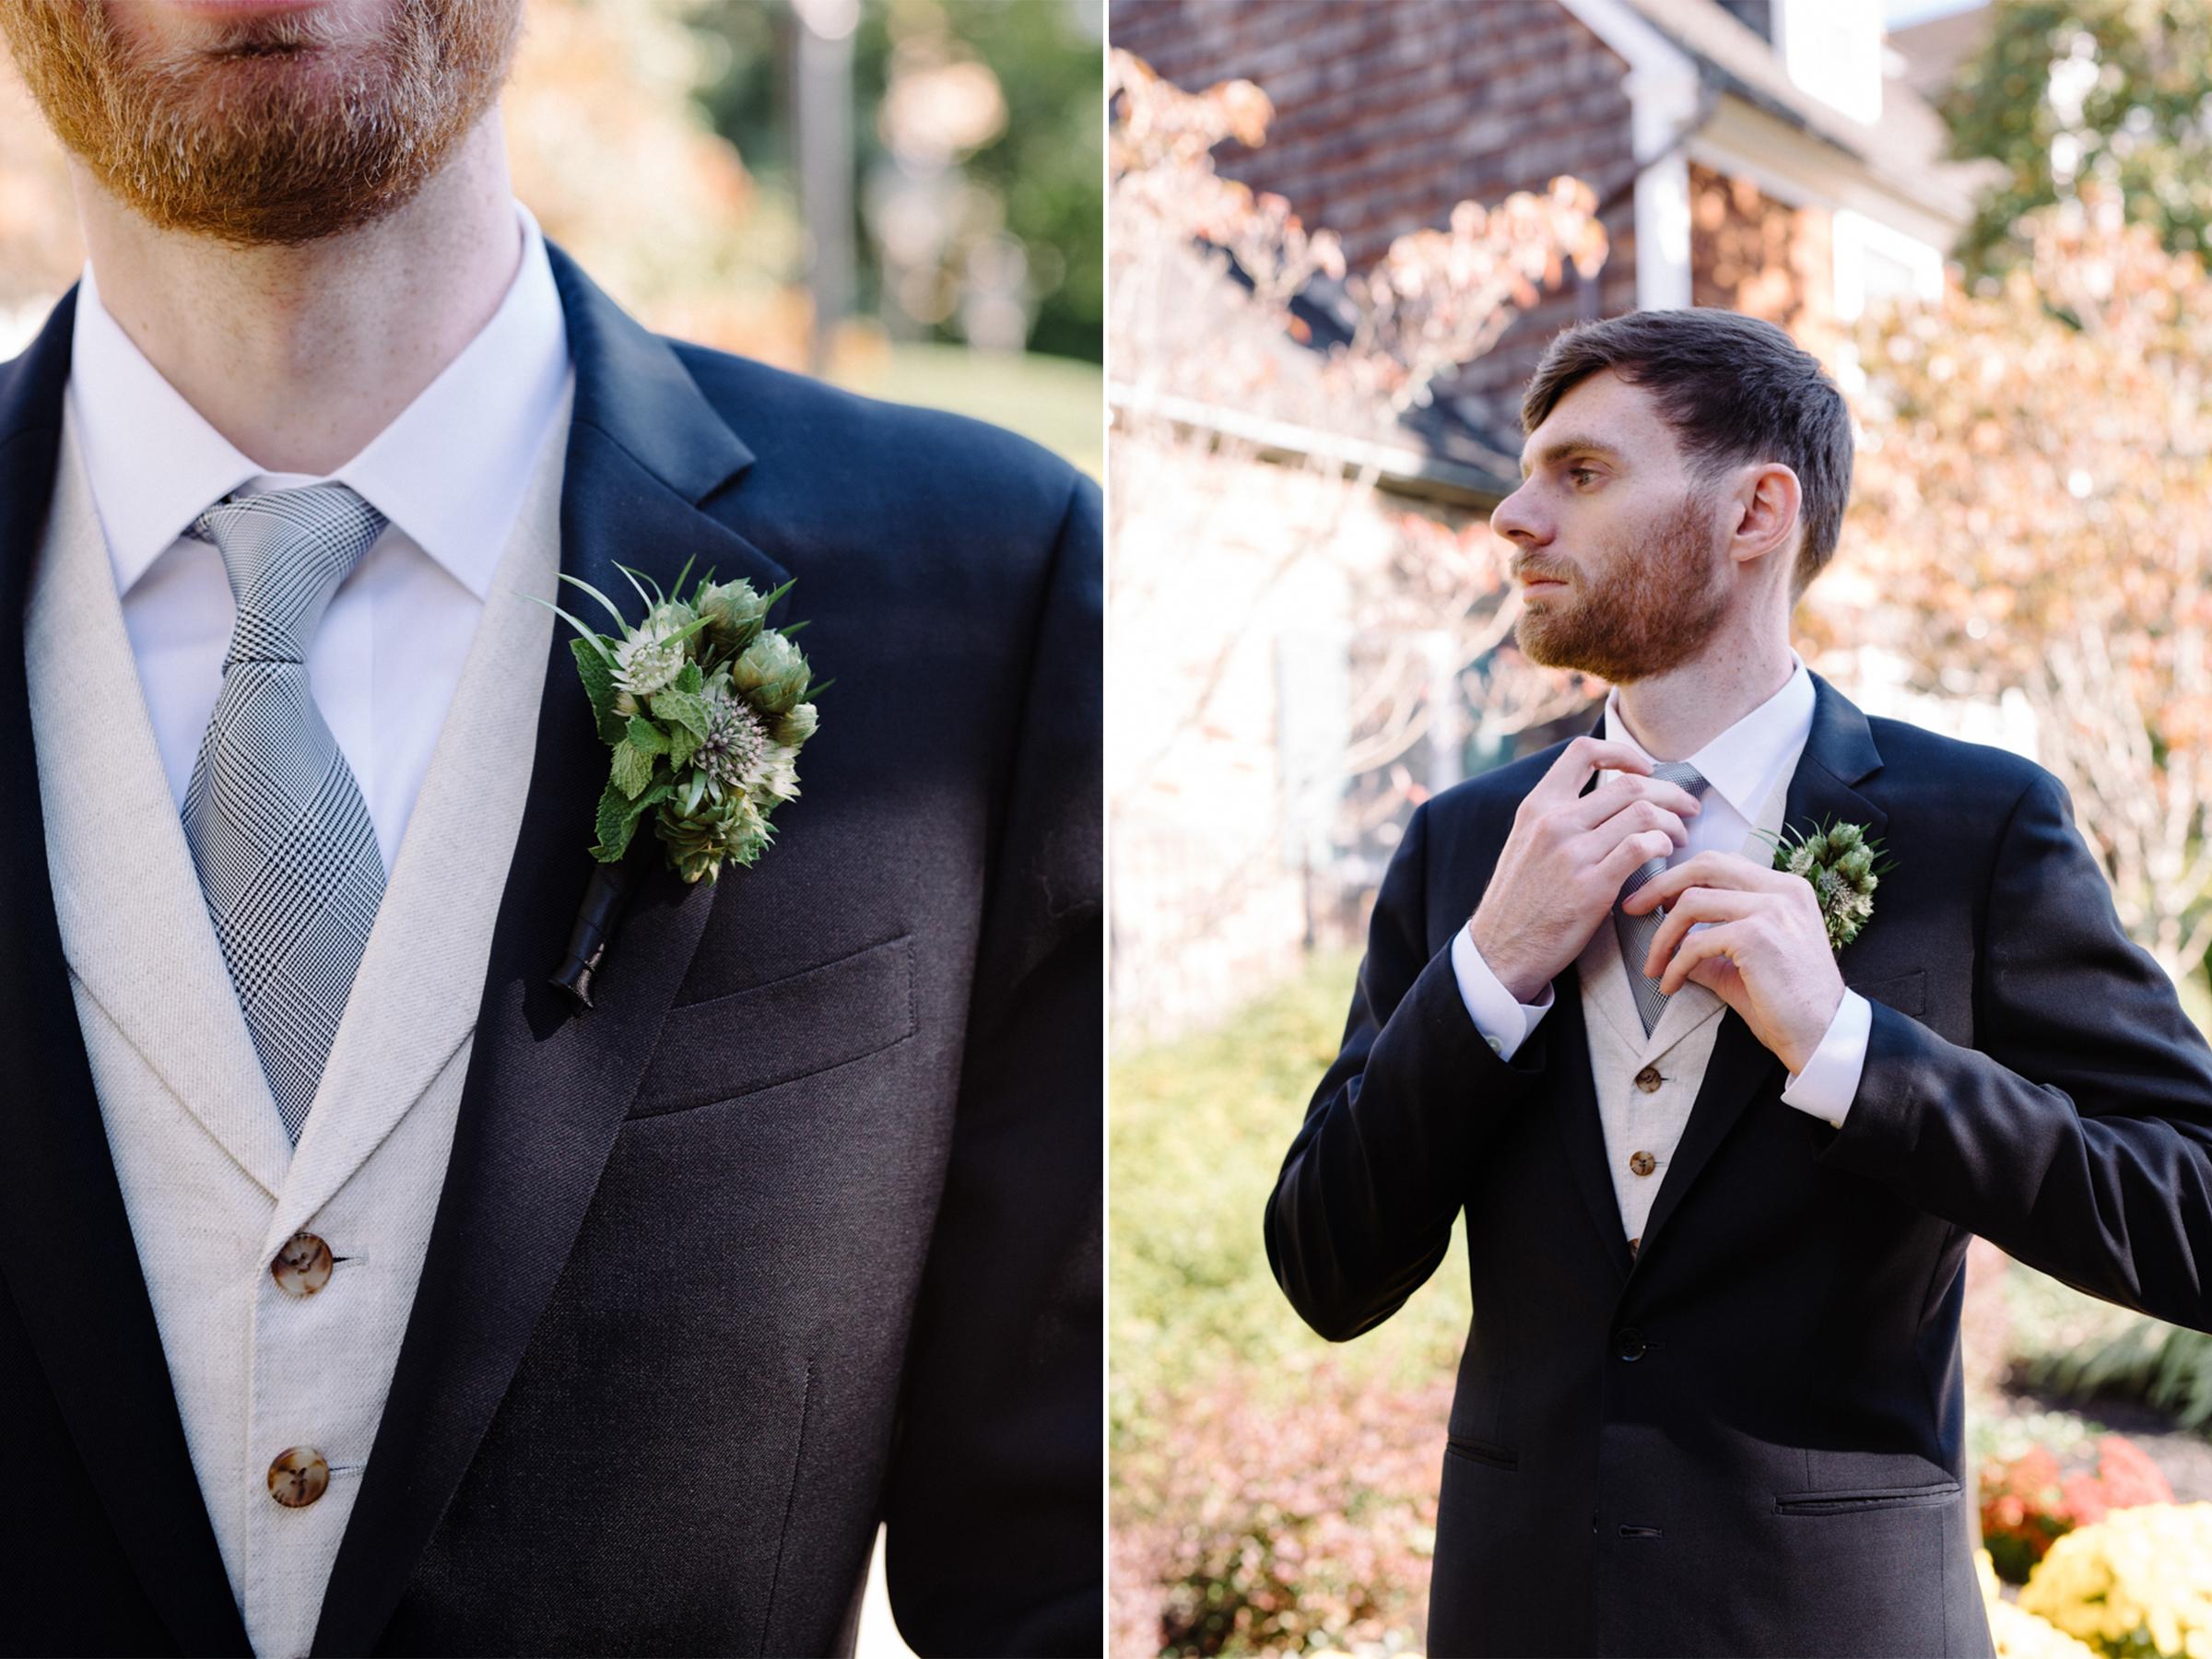 Chelsea+James- Groom Portraits-Hopps Boutonniere- Viburnum Designs- Princeton Wedding- Olivia Christina Photo.jpg